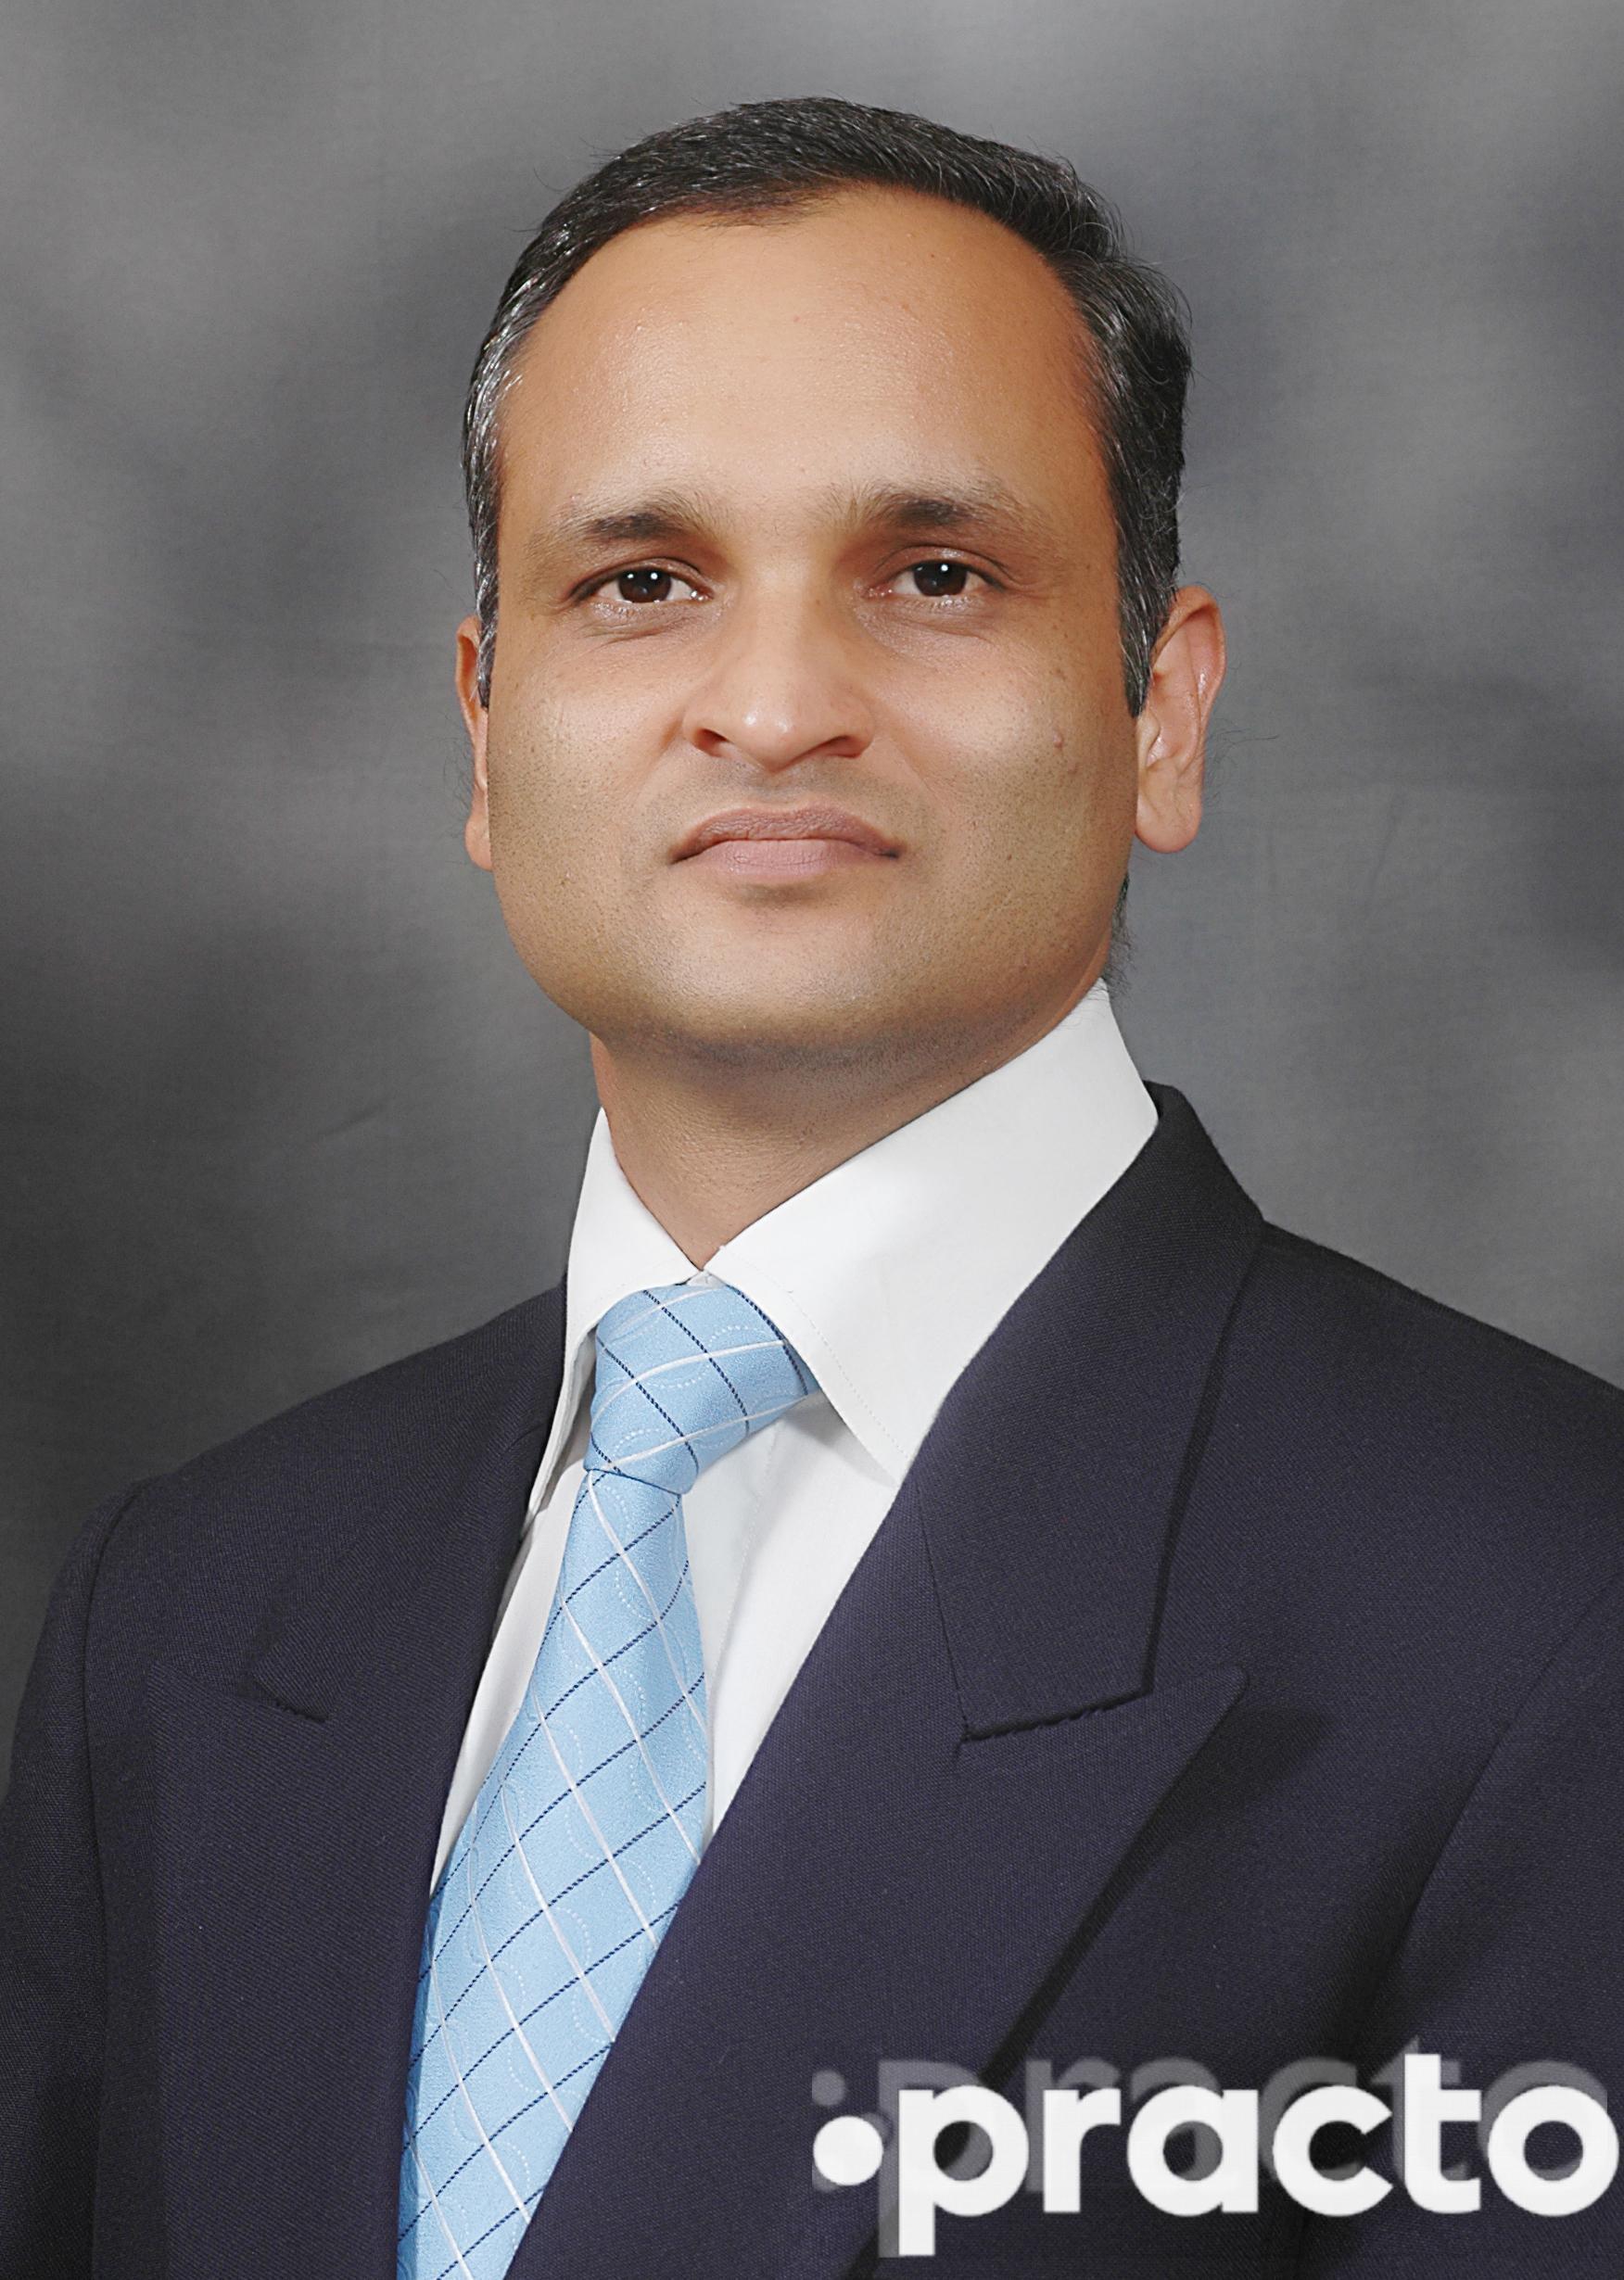 Dr. A S Pandey - Orthopedist